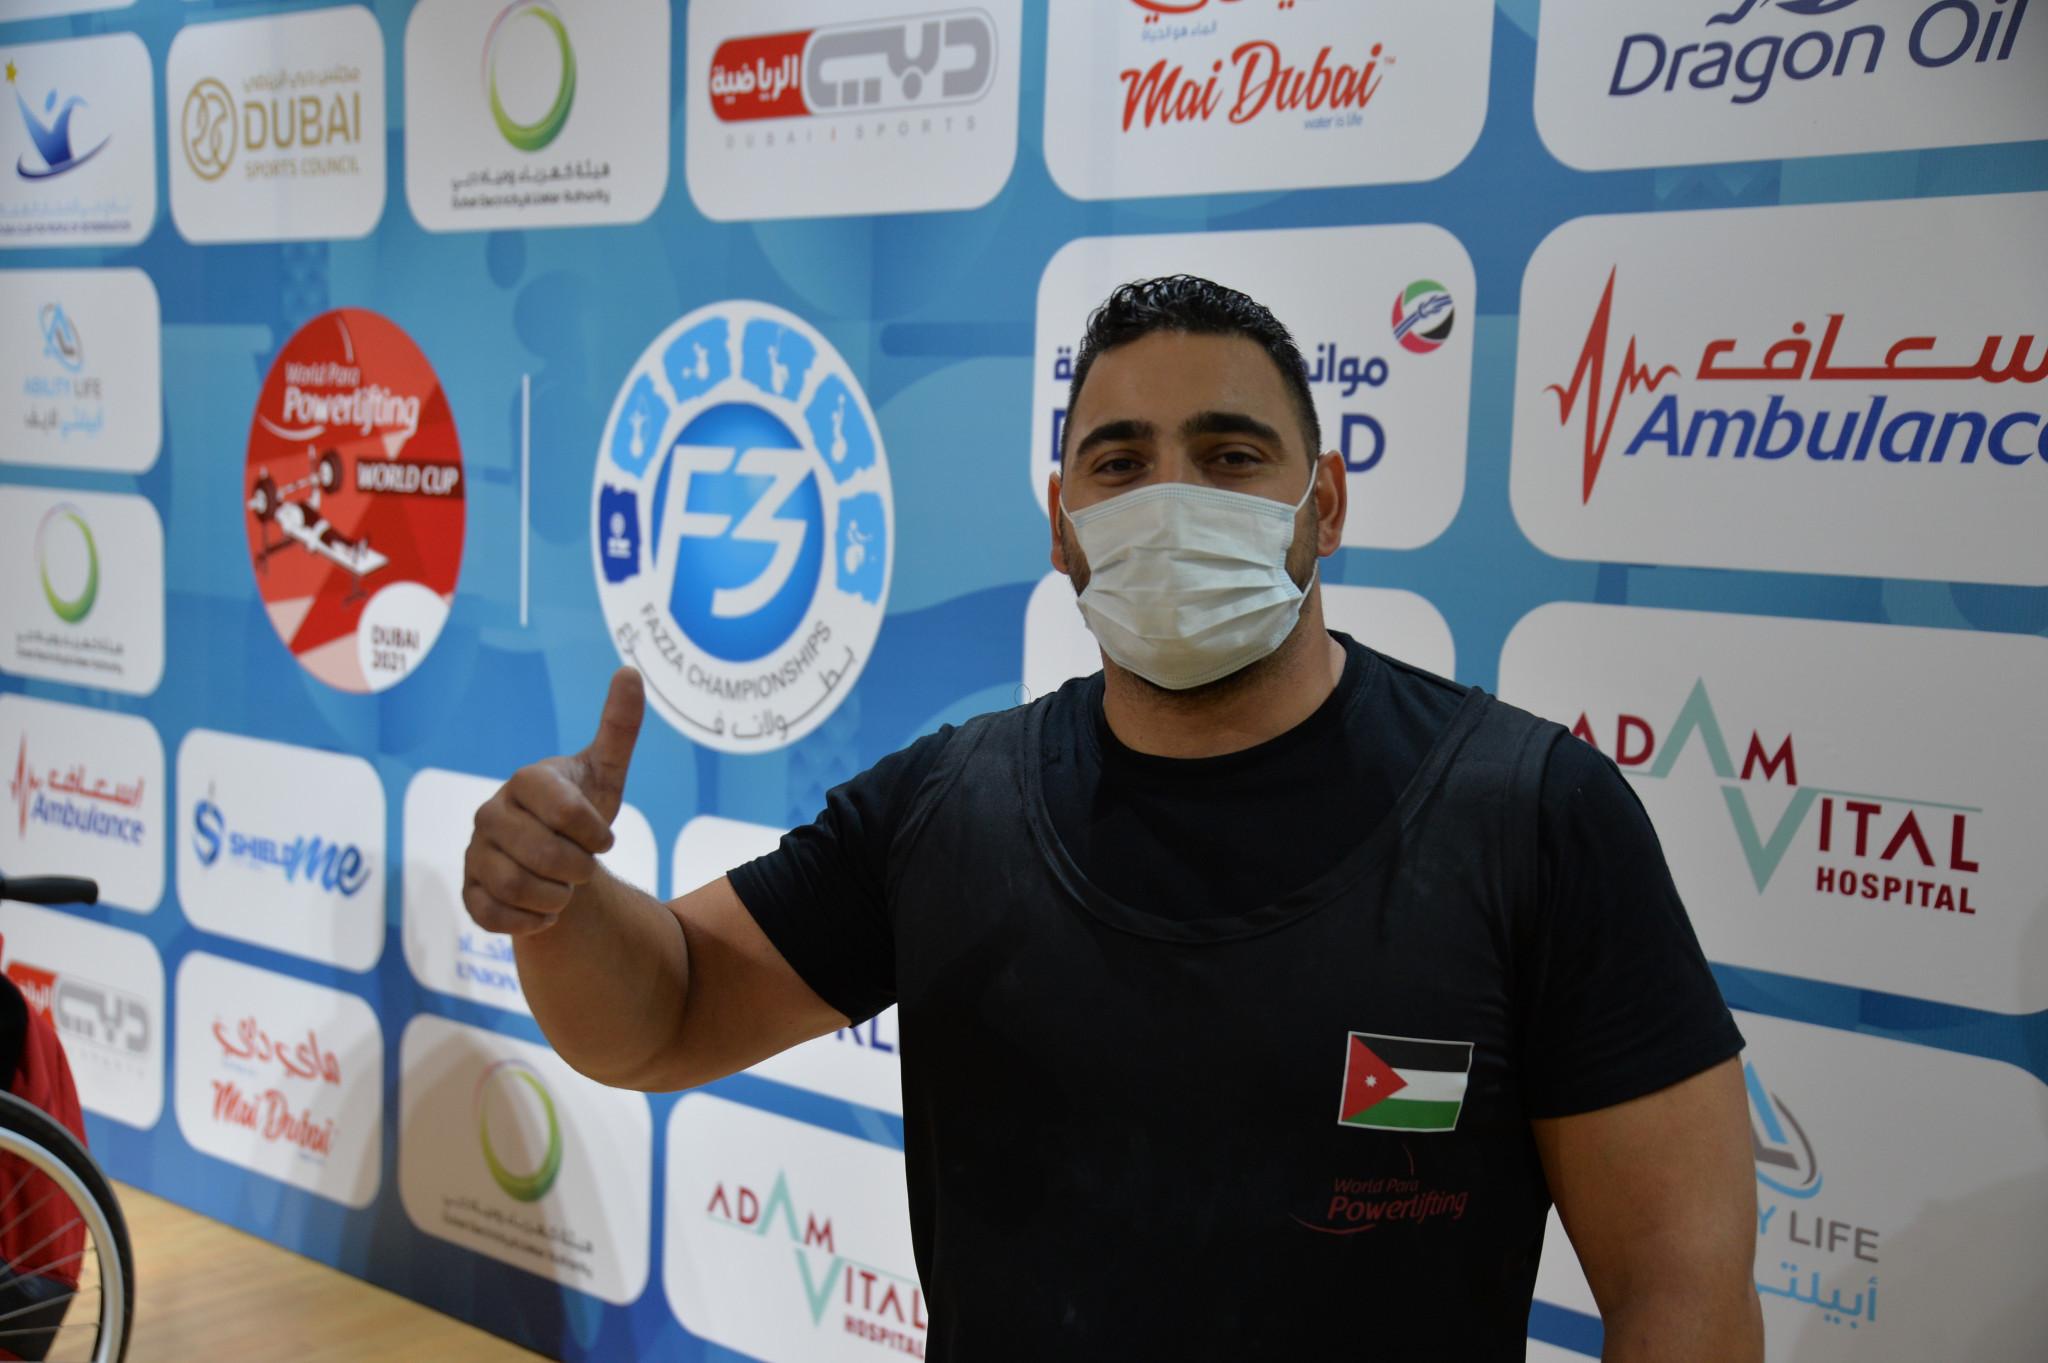 Jordan's Abdelkareem Khattab broke the world record twice en route to earning the men's under 88-kilogram gold medal at the Dubai 2021 Para Powerlifting World Cup ©Dubai 2021